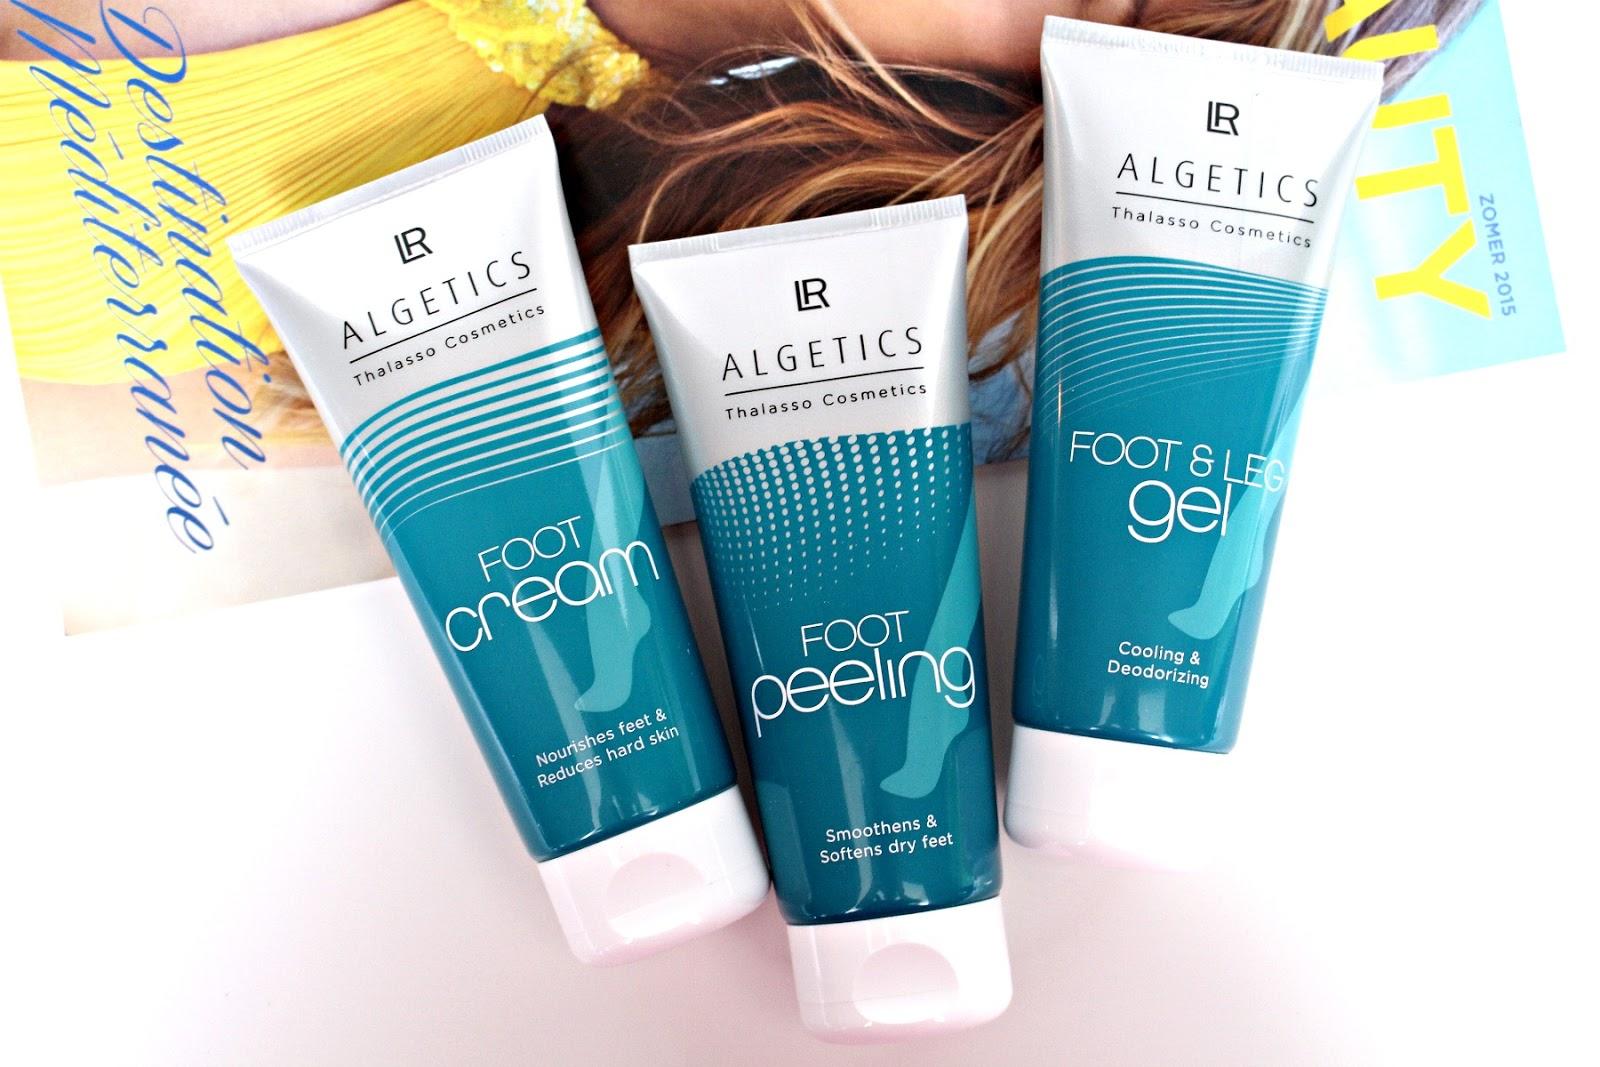 LR Algetics